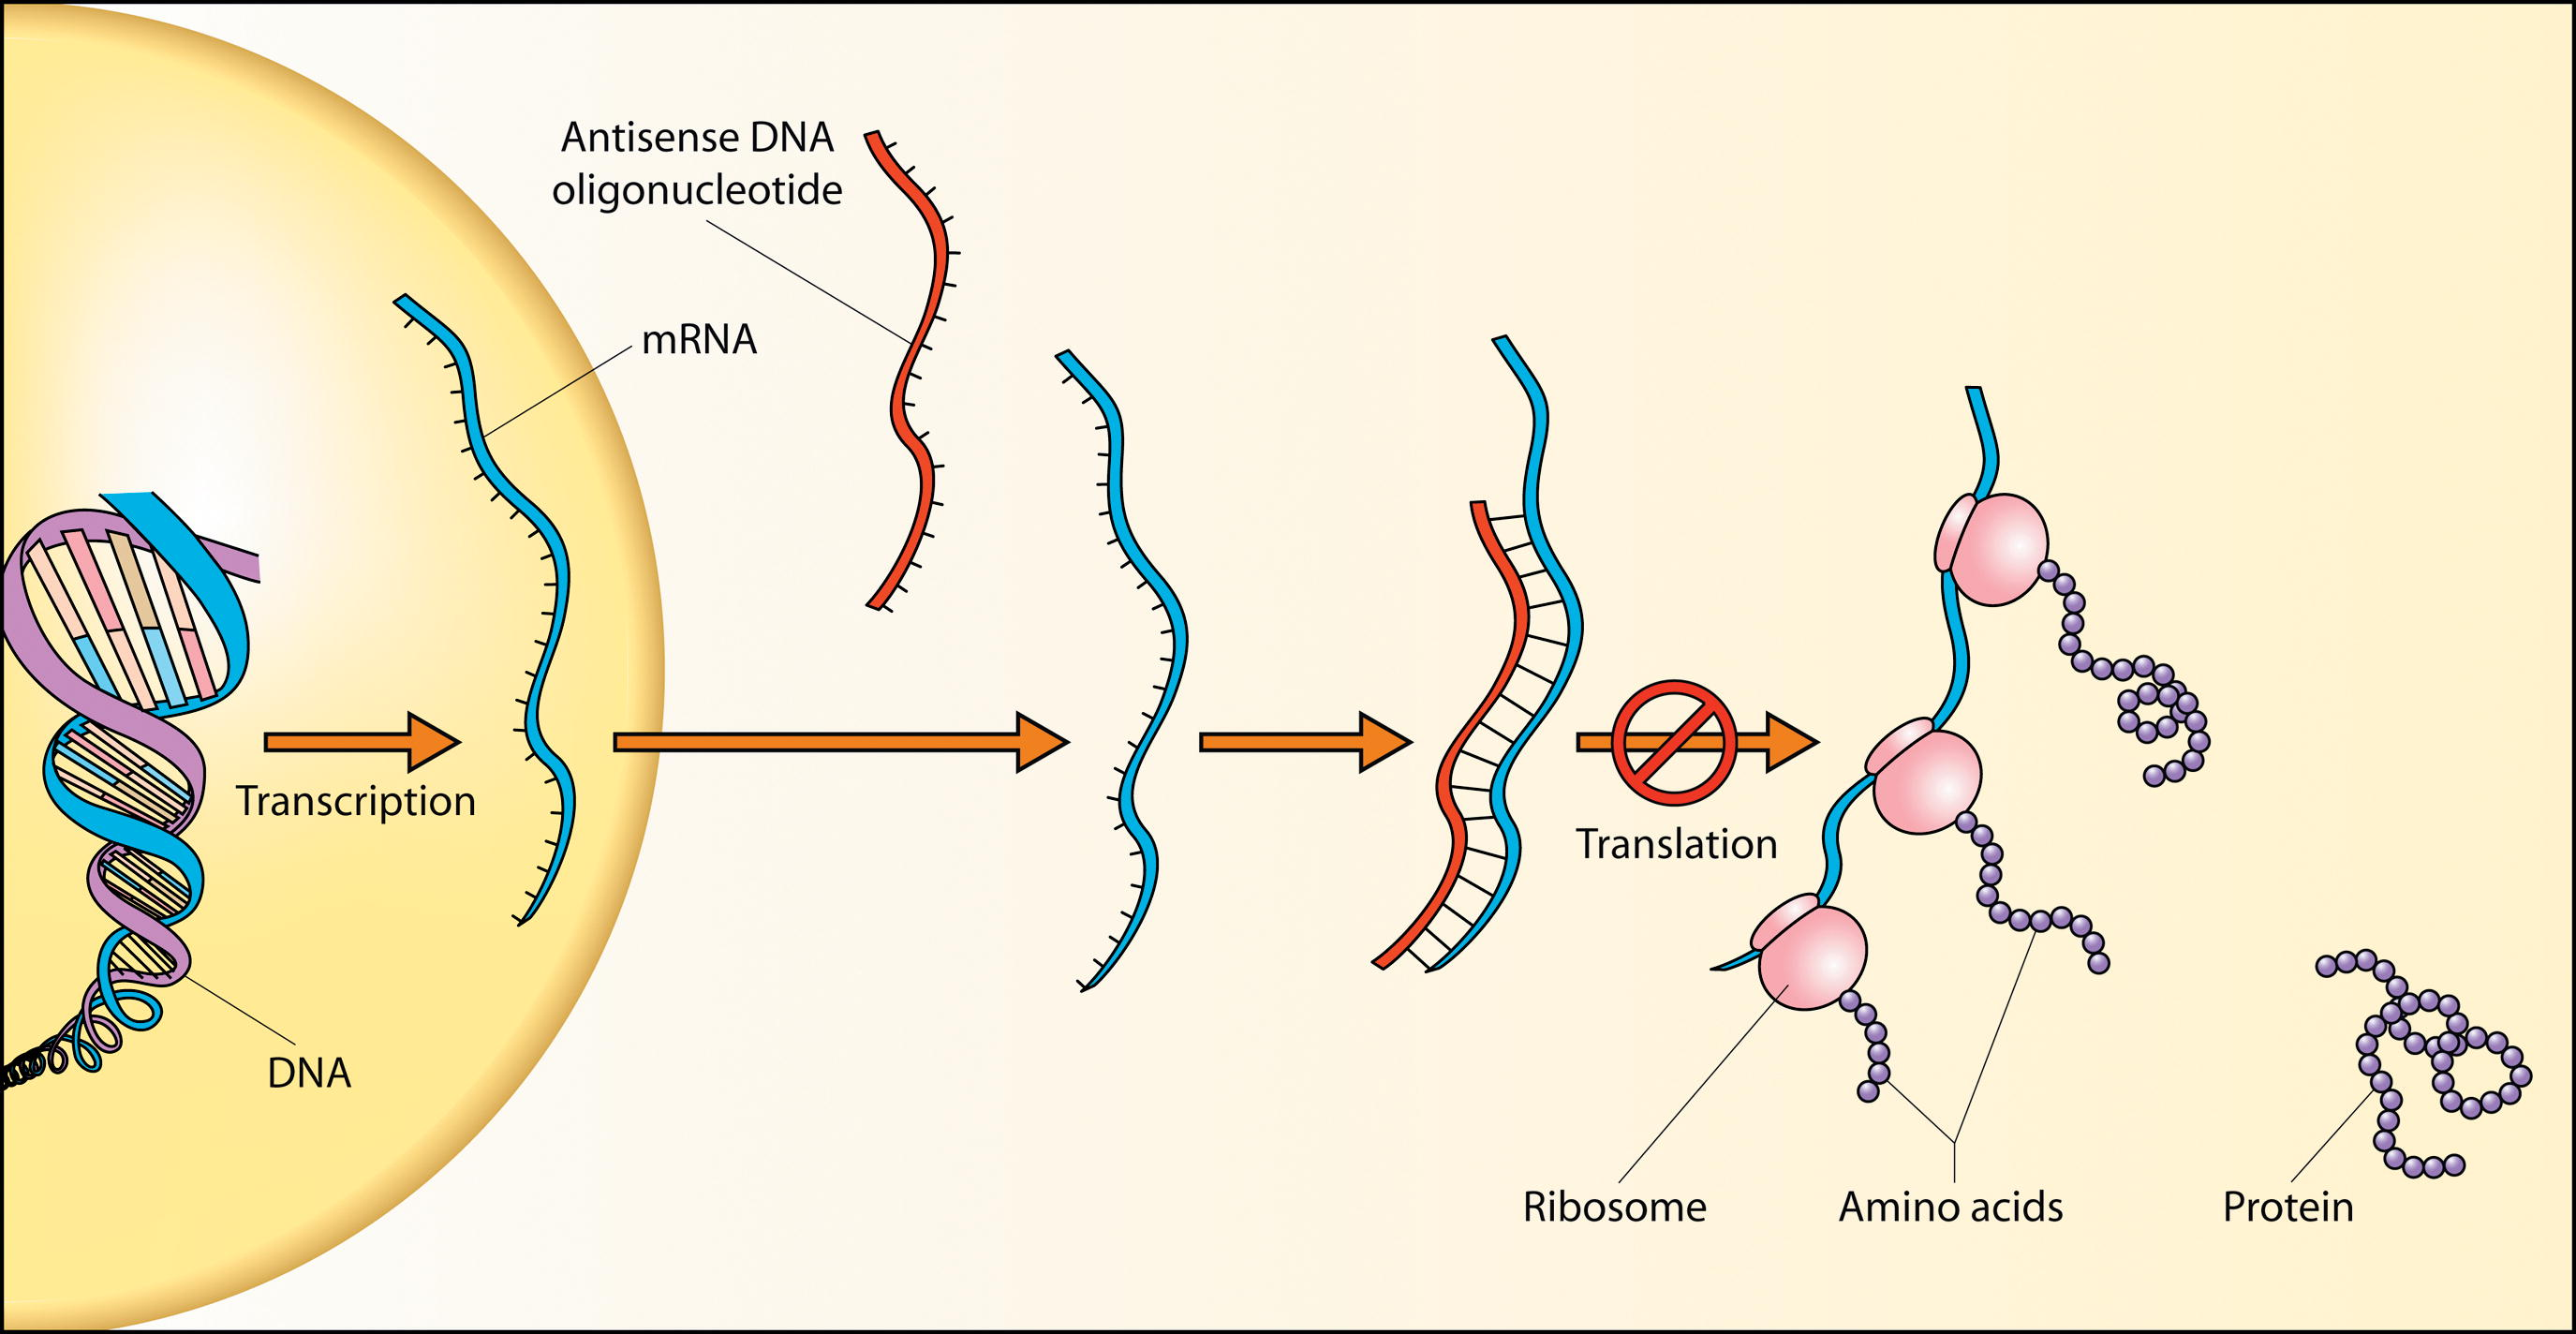 File:Antisense DNA oligonucleotide.png - Wikipedia, the free ...